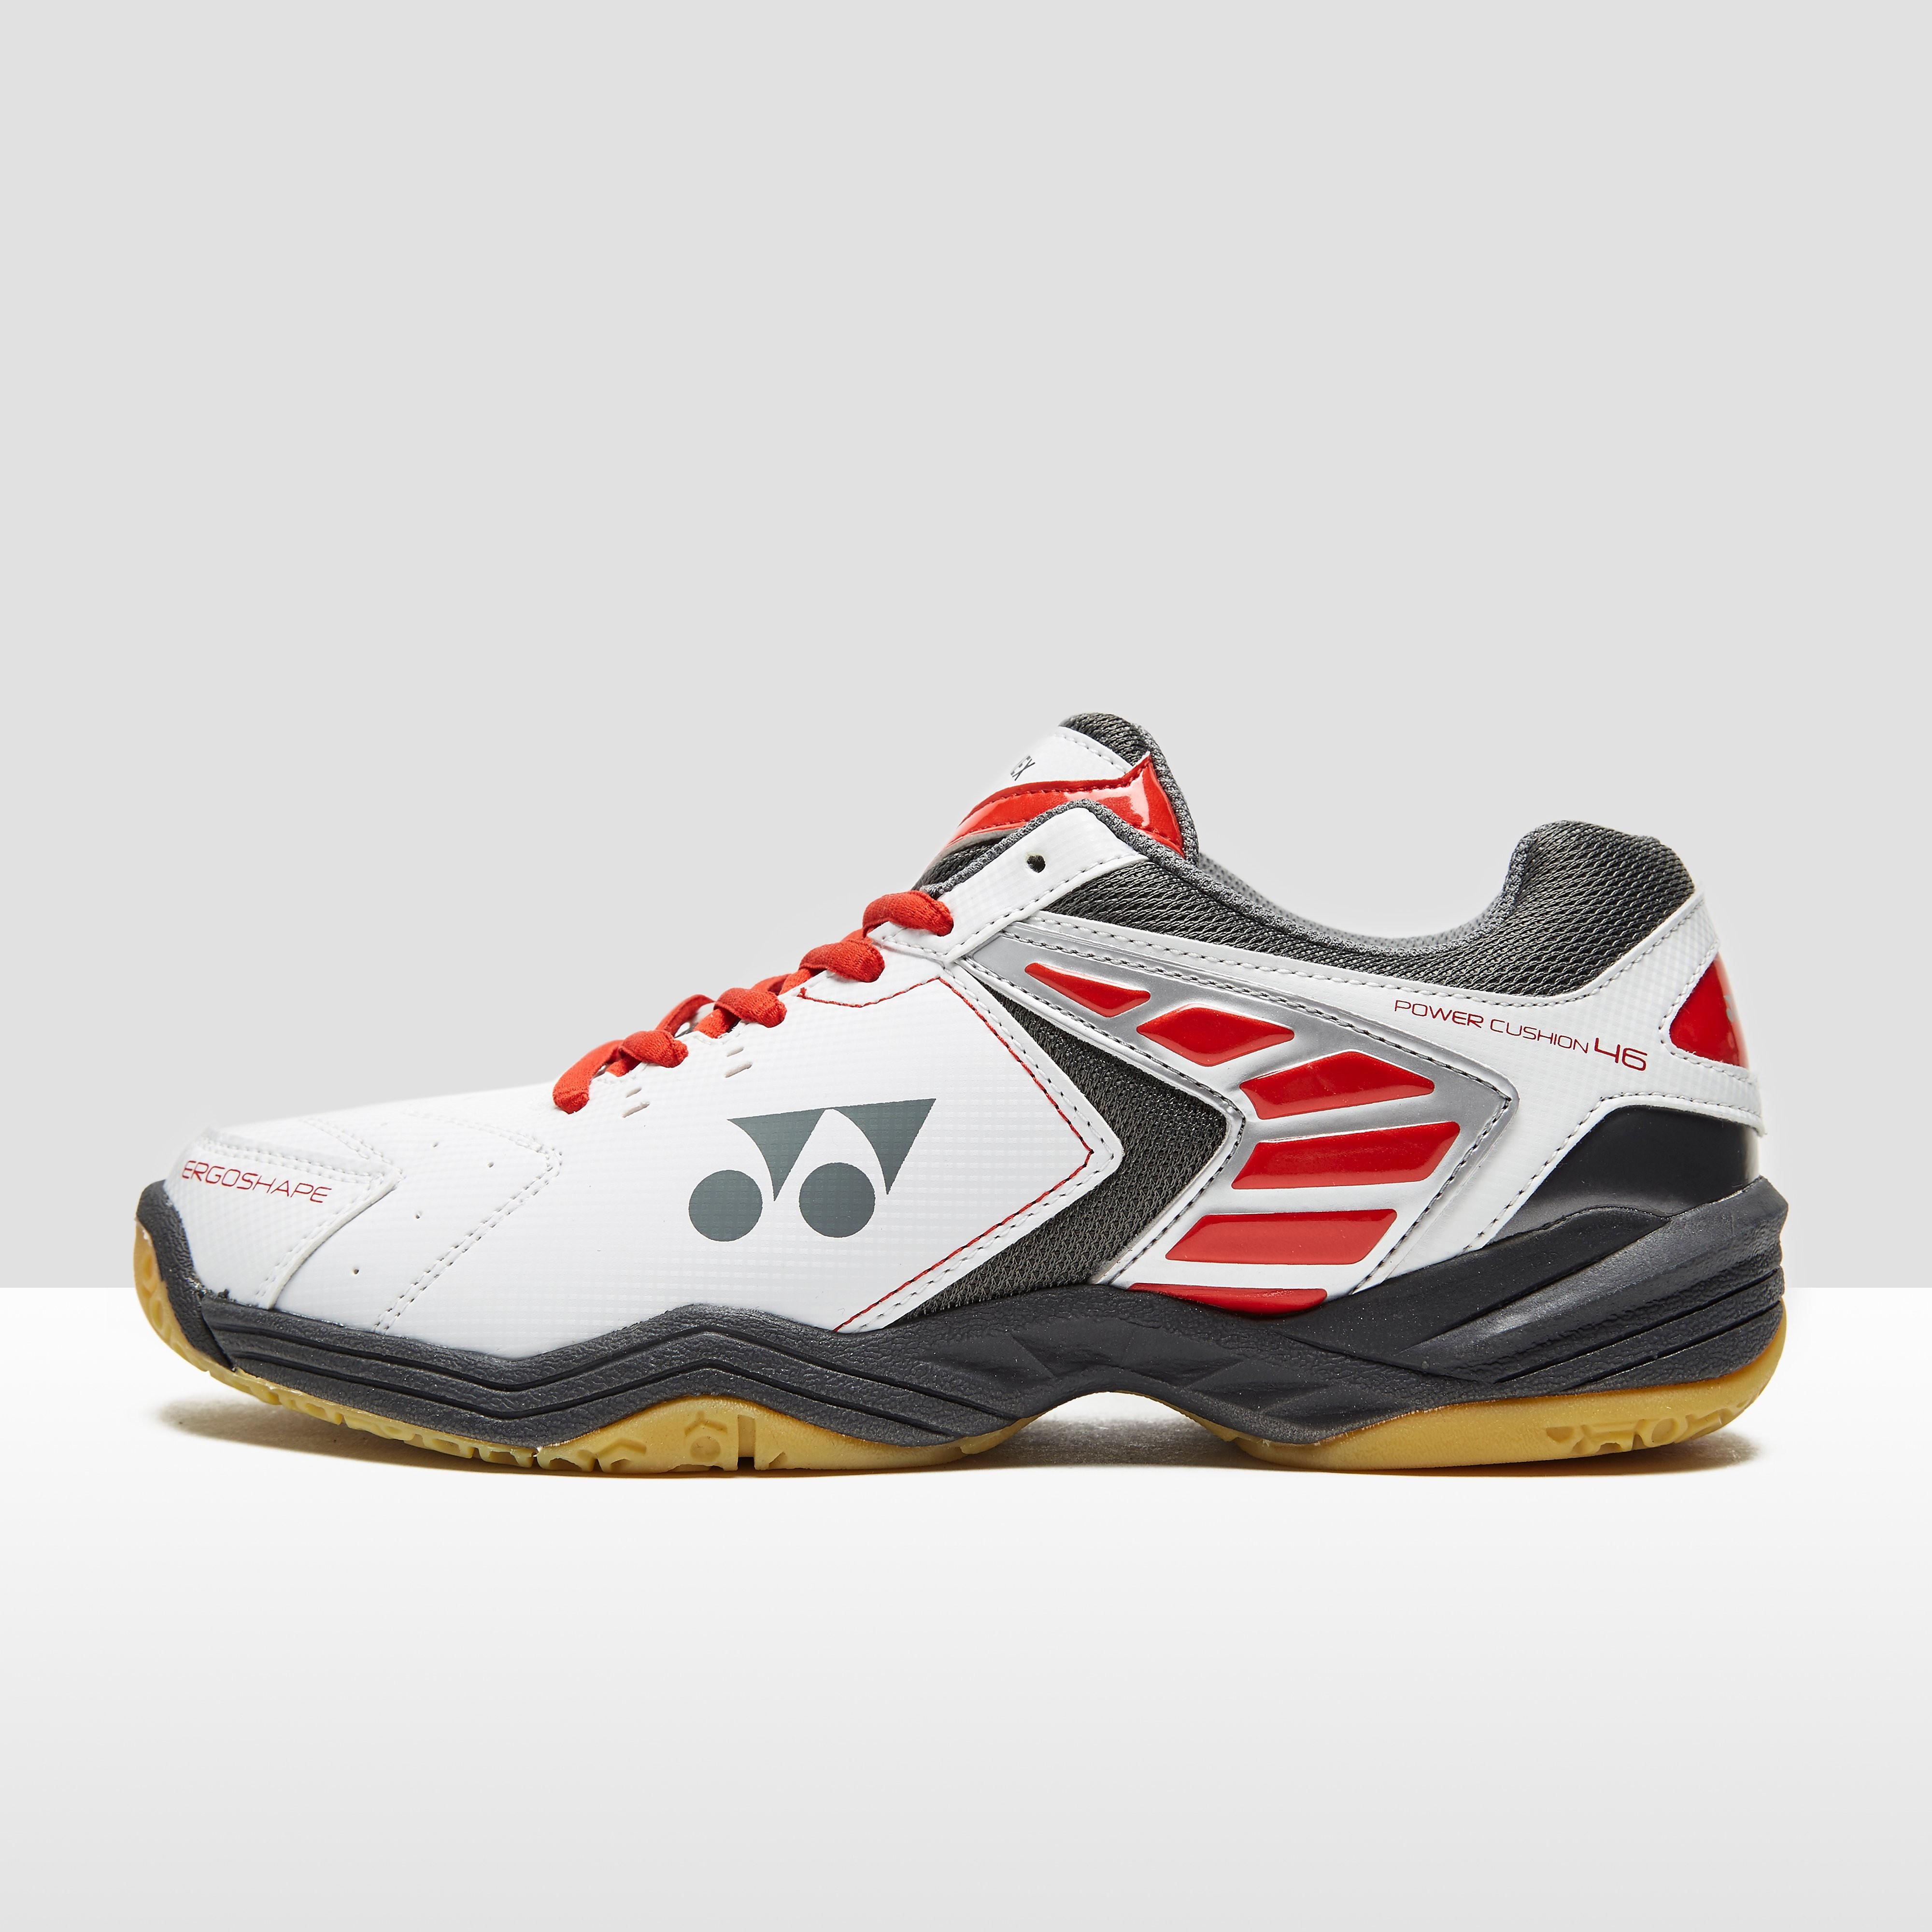 Yonex Power Cushion 46 Men's Badminton Shoes